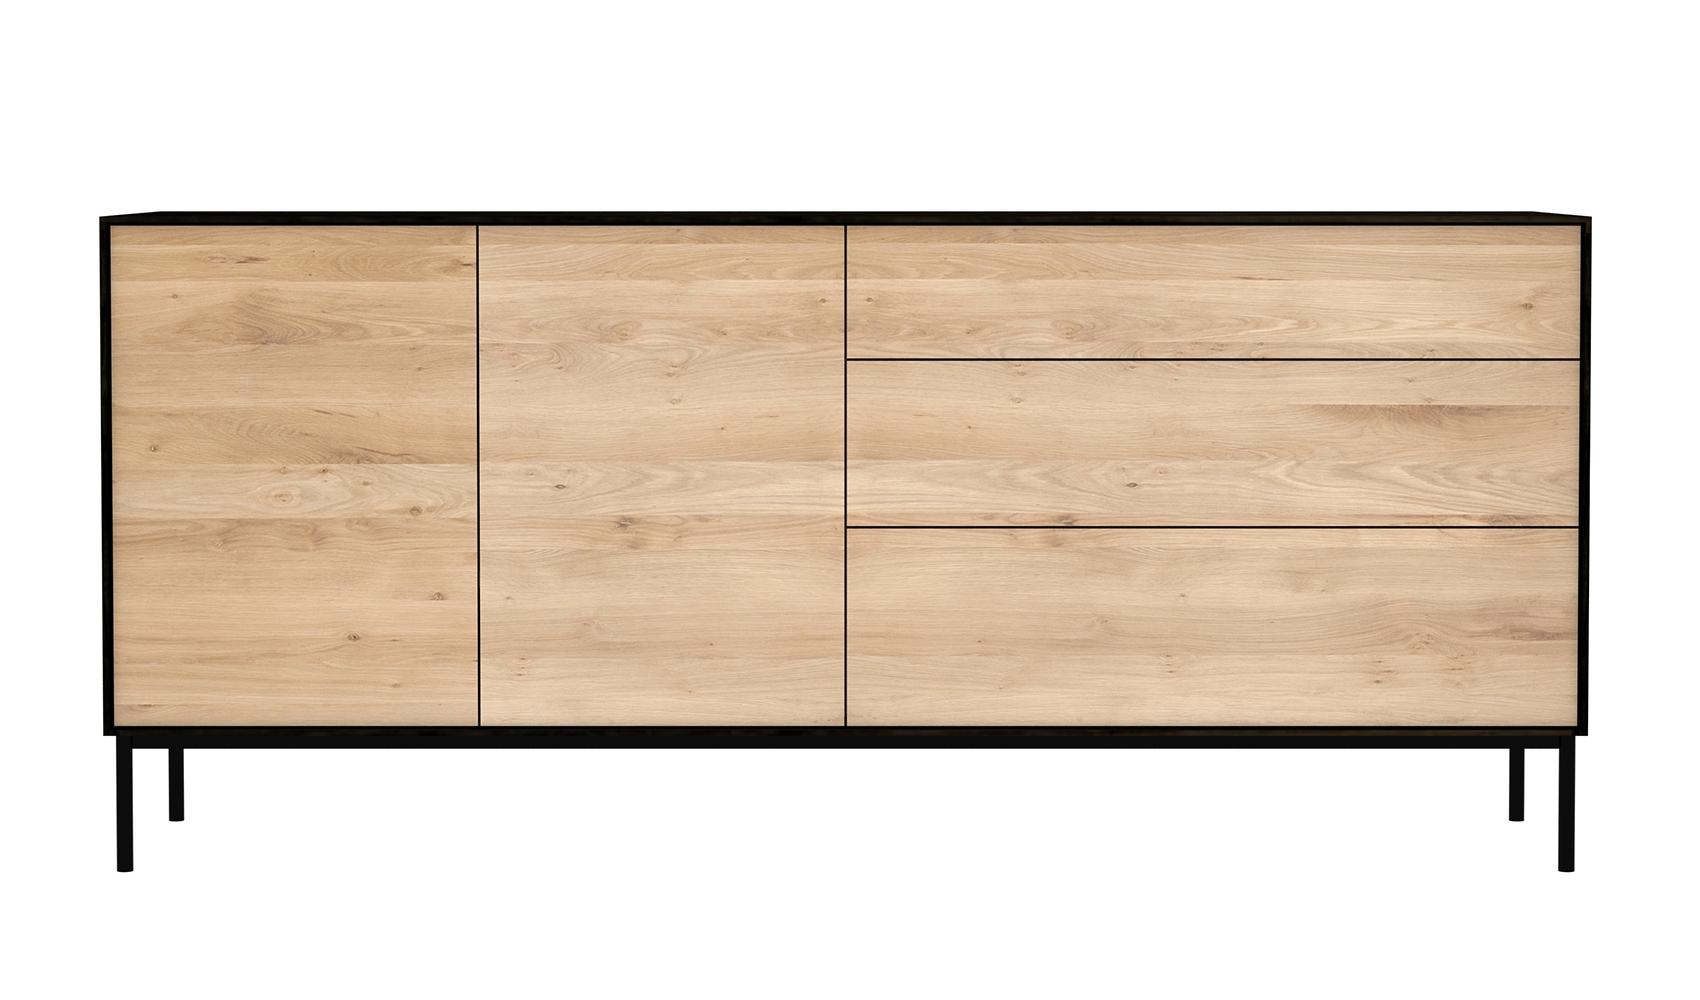 Levně Ethnicraft designové komody Blackbird - 2 doors/ 3 drawers